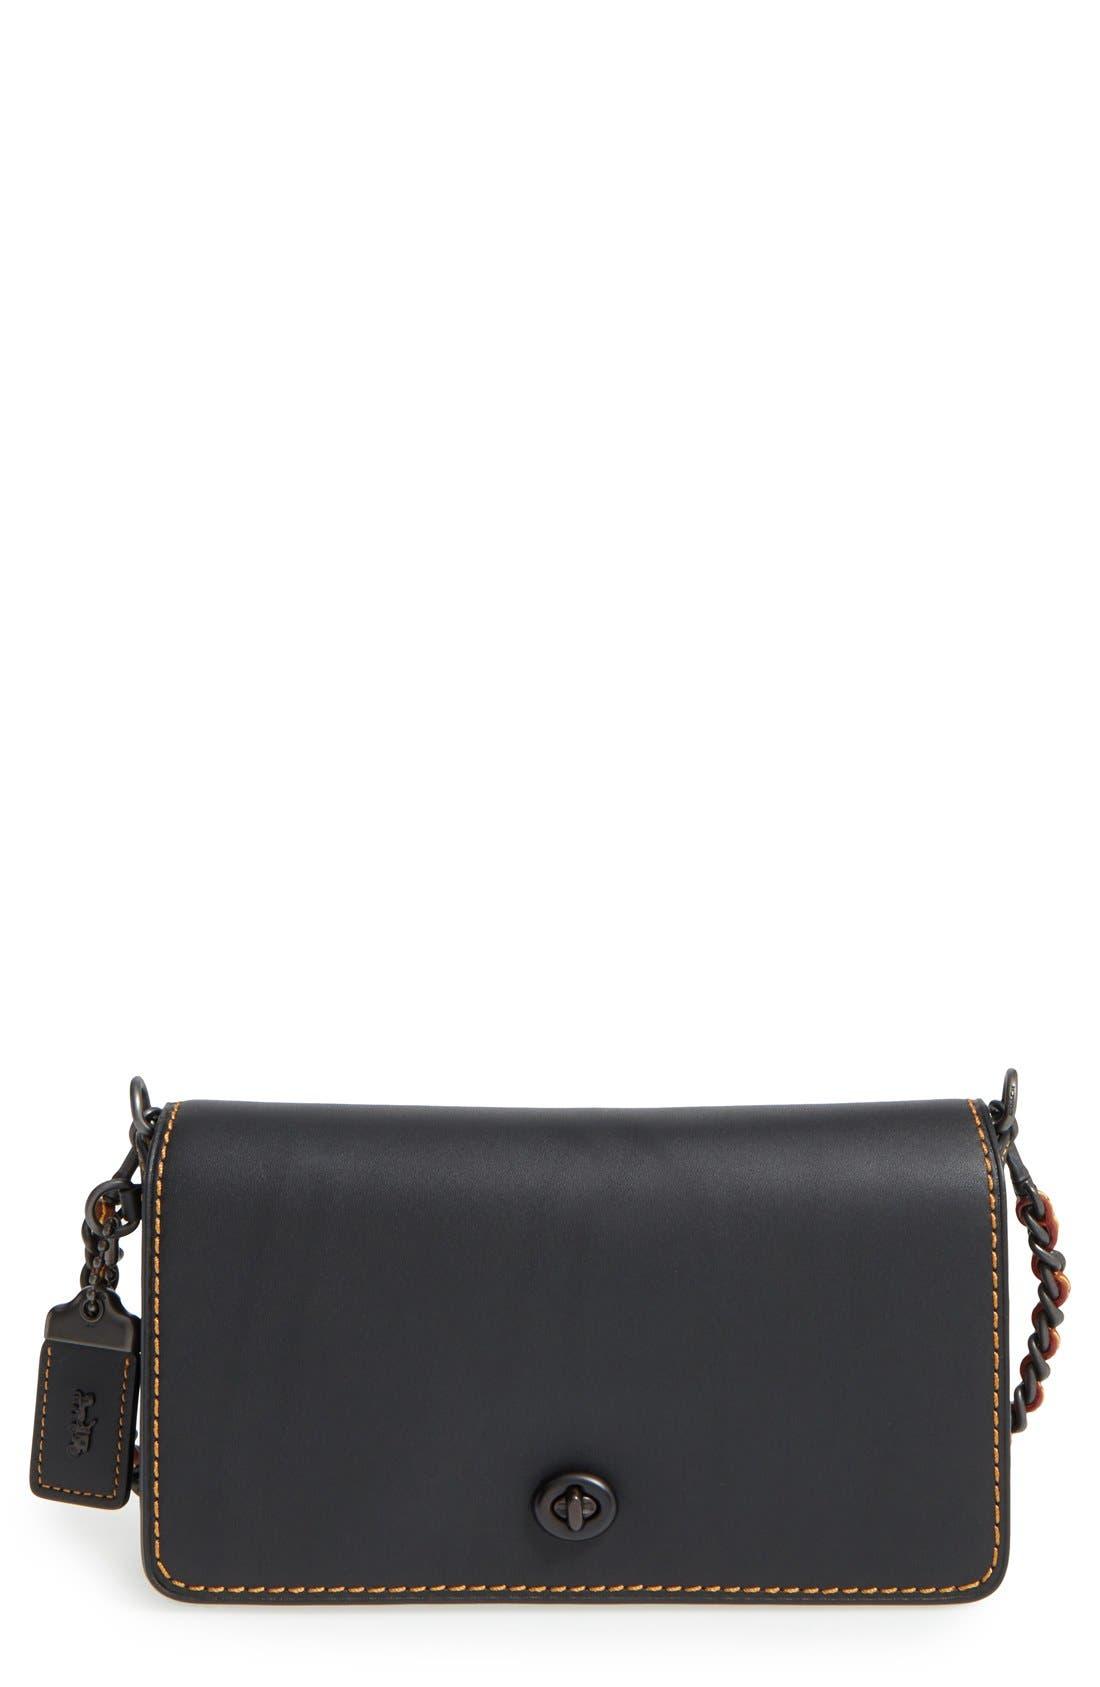 Main Image - COACH 1941 'Dinky' Leather Crossbody Bag